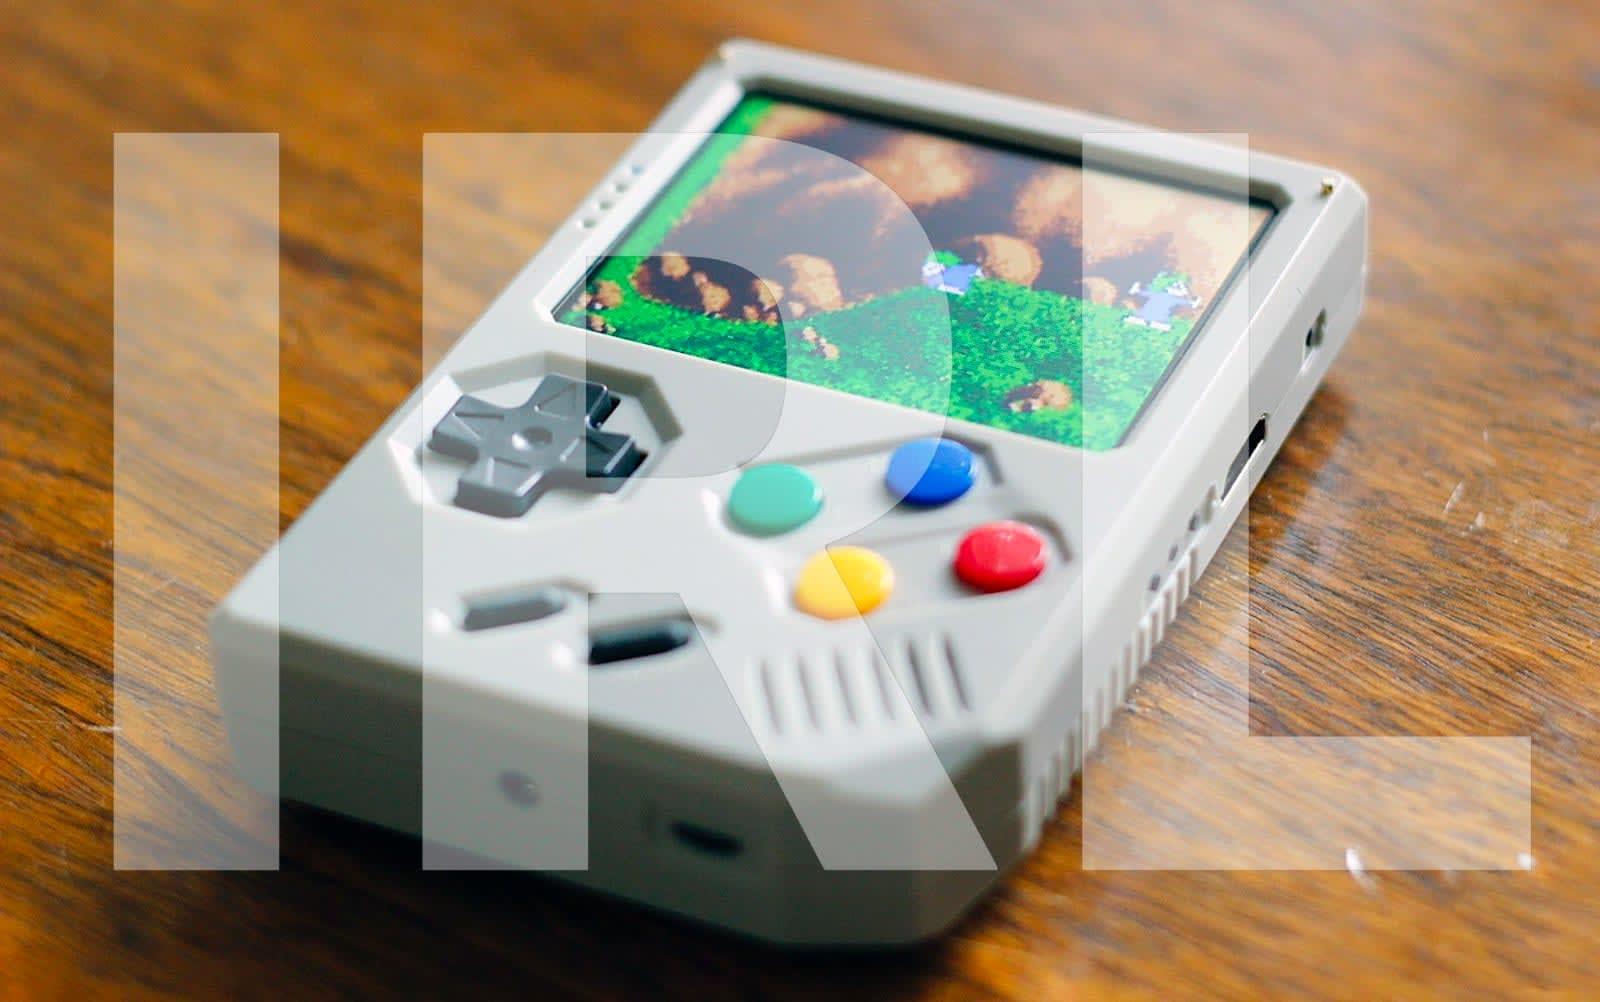 What we're buying: RetroStone's smart take on retro handheld